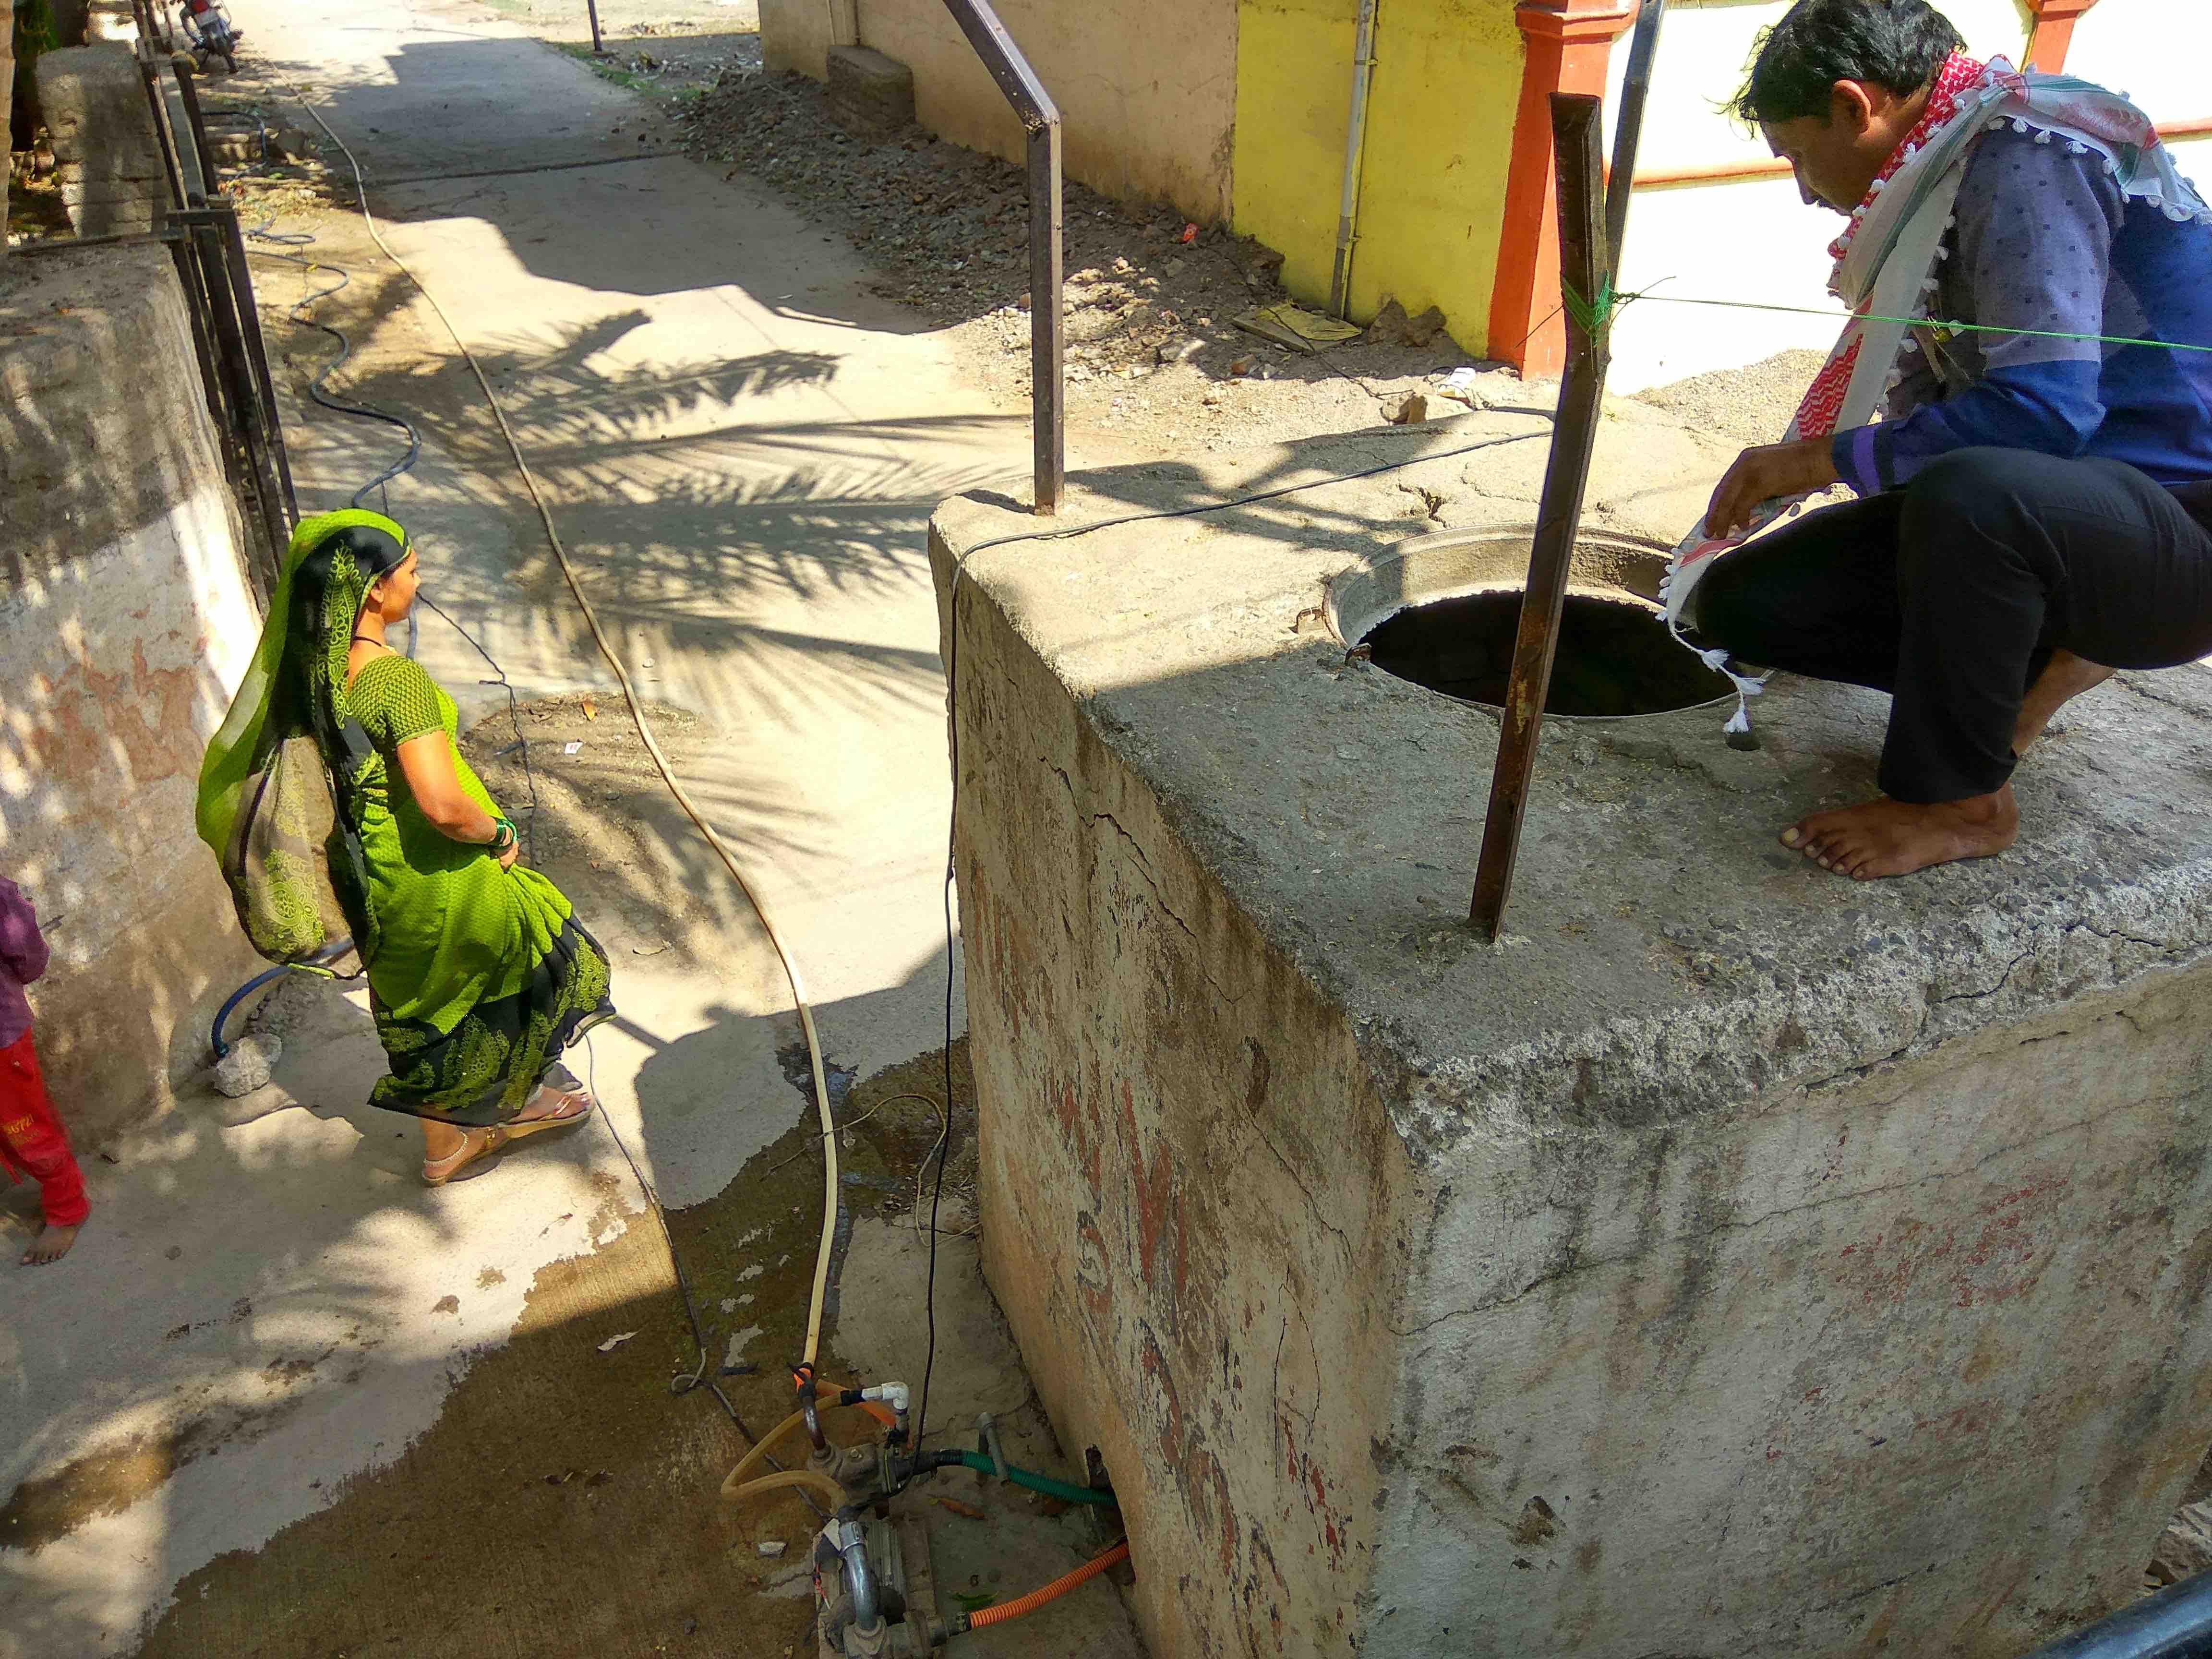 In Ektanagar, residents pump up water from a subterranean neher – often their only source of water. Credit: Raghu Karnad